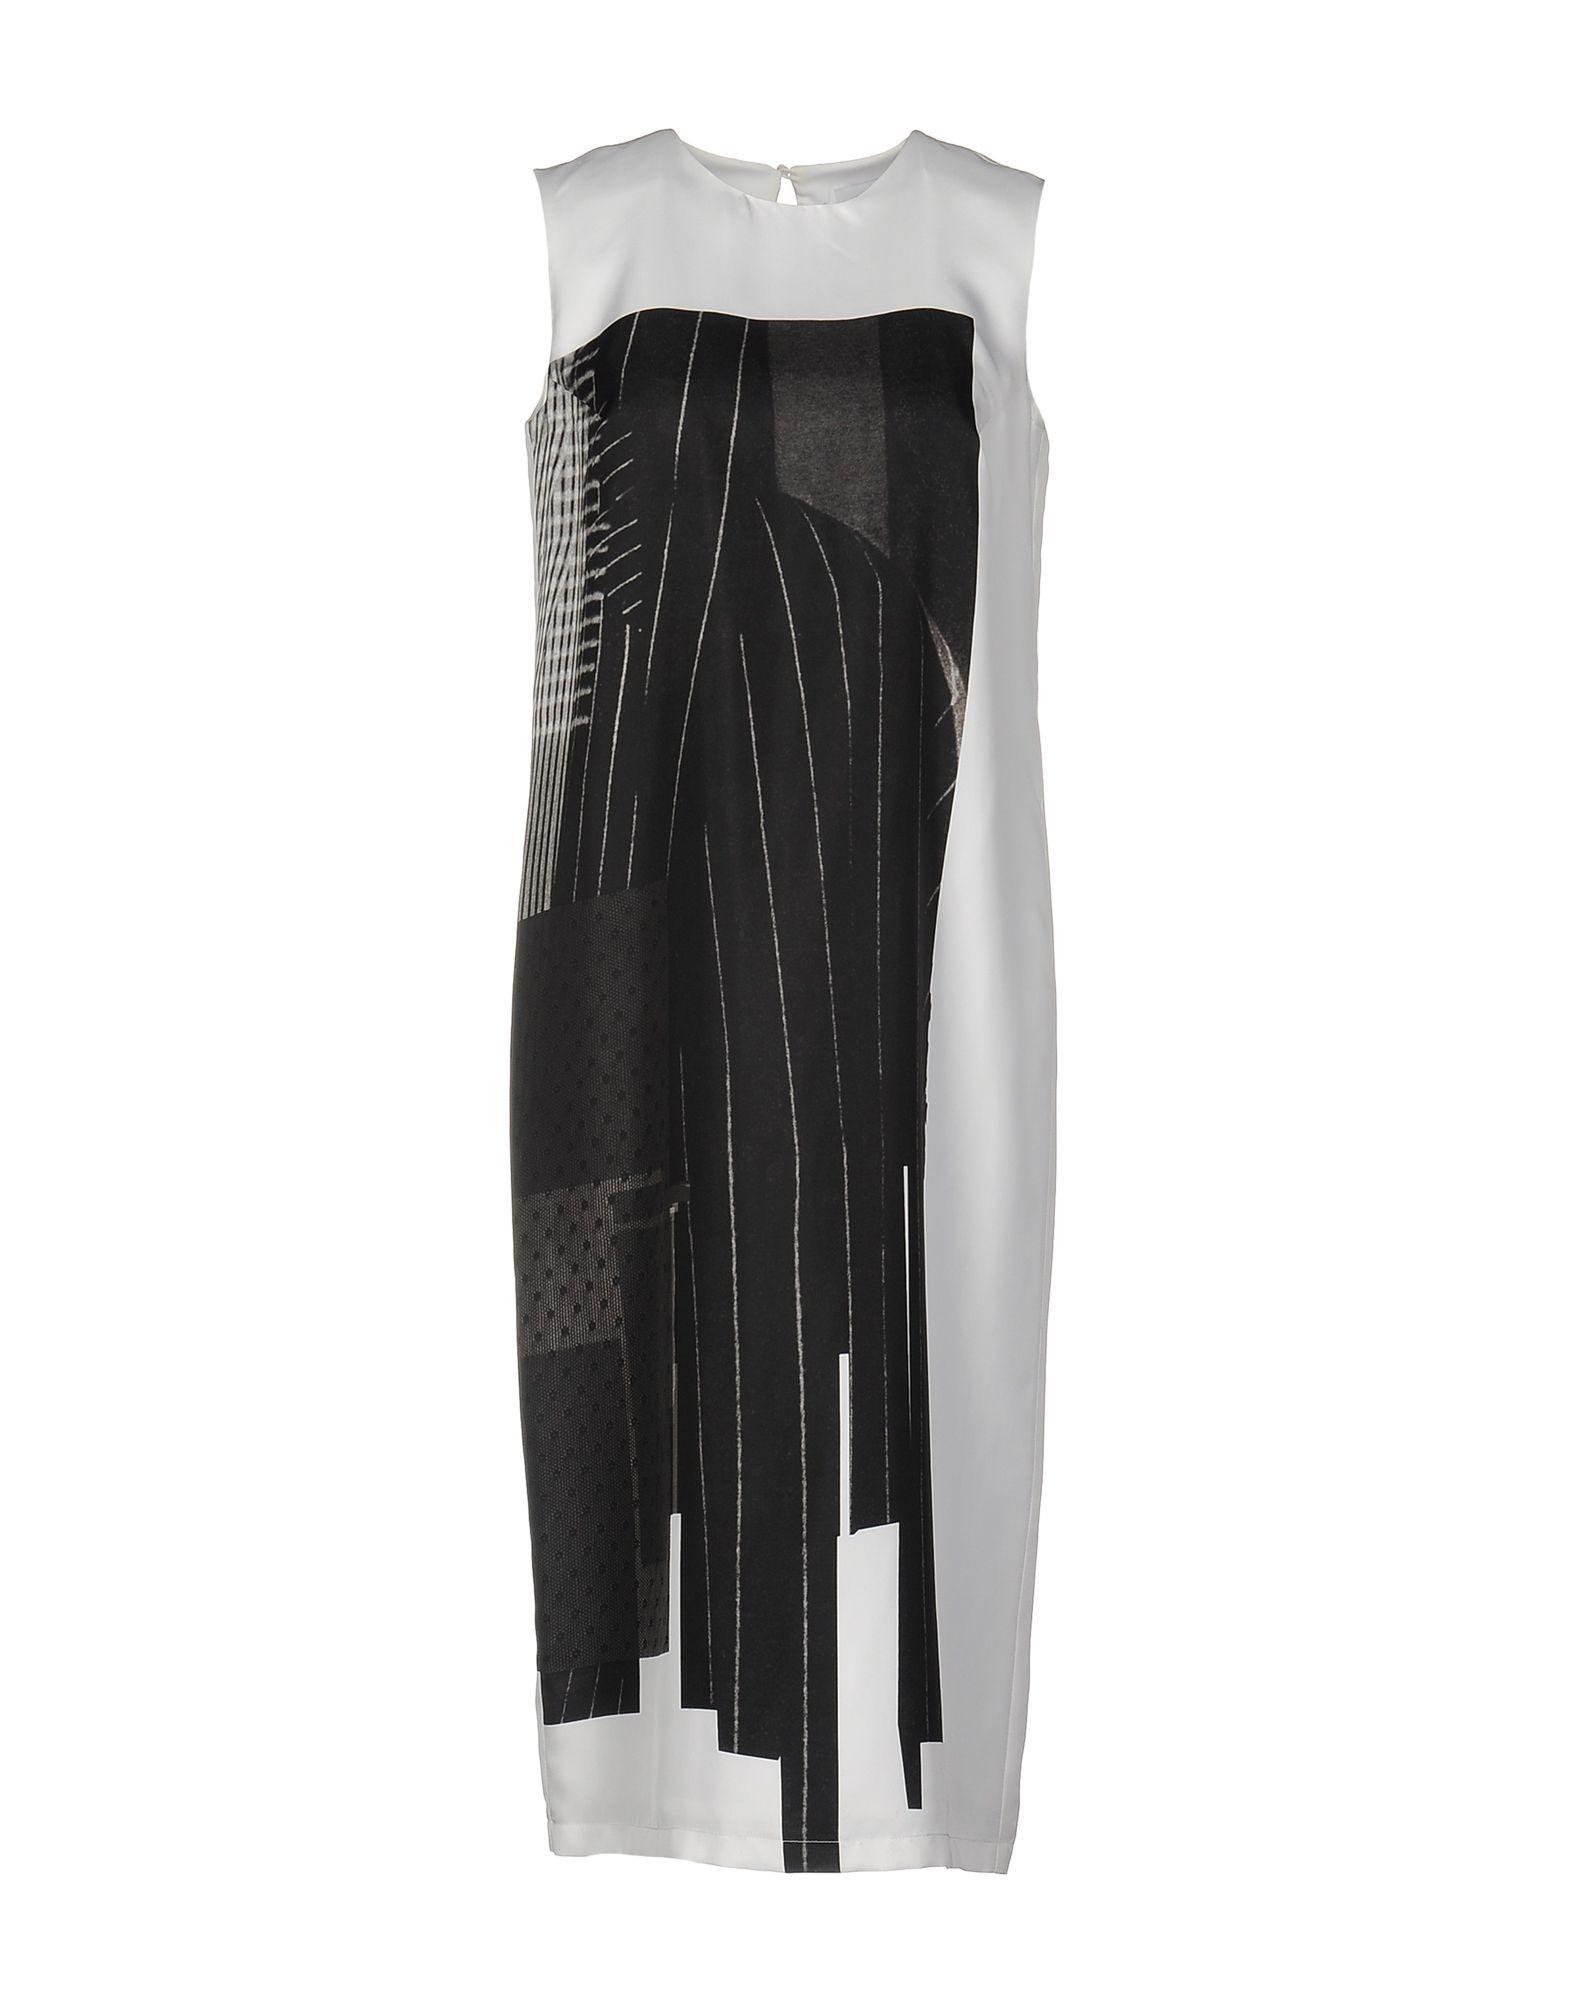 DKNY White Silk Dress